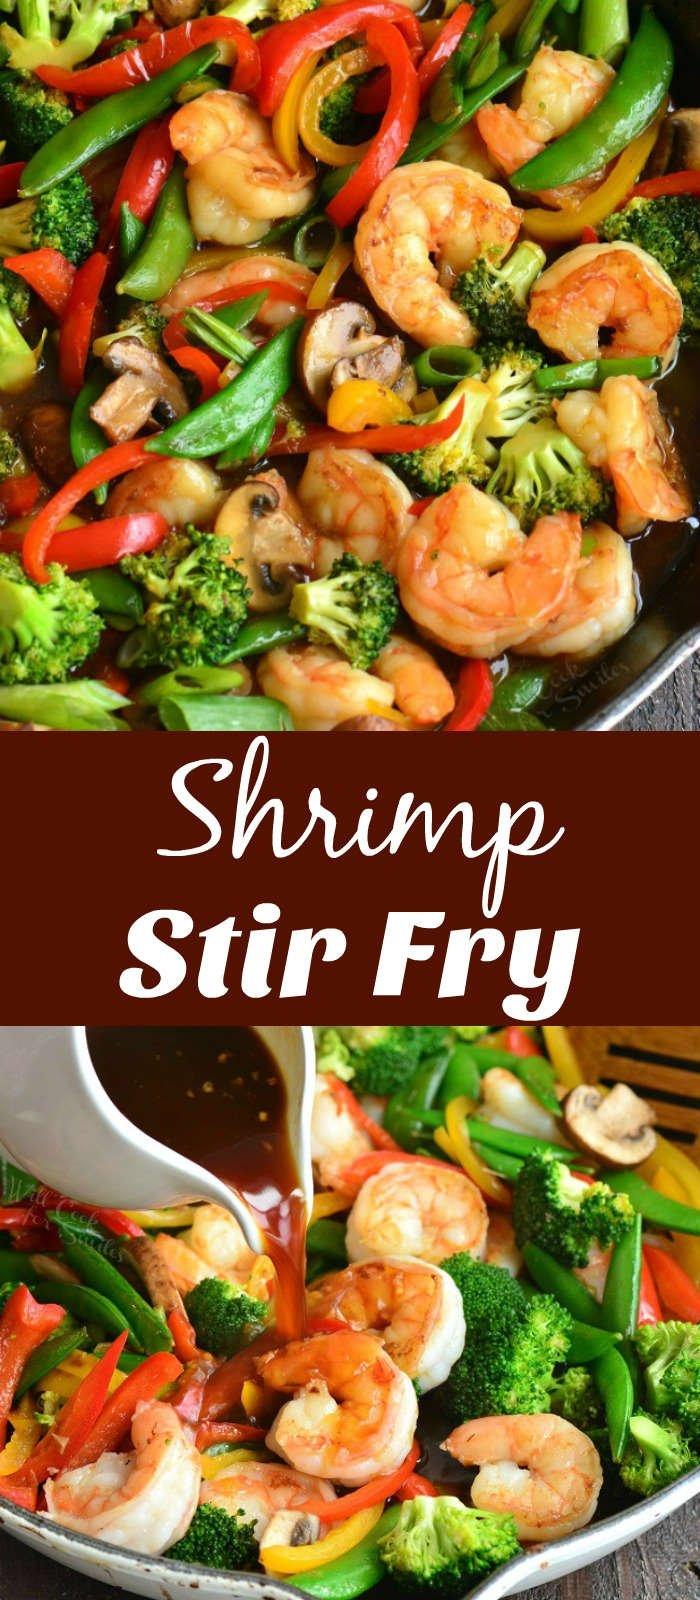 shrimp stir fry collage in a pan